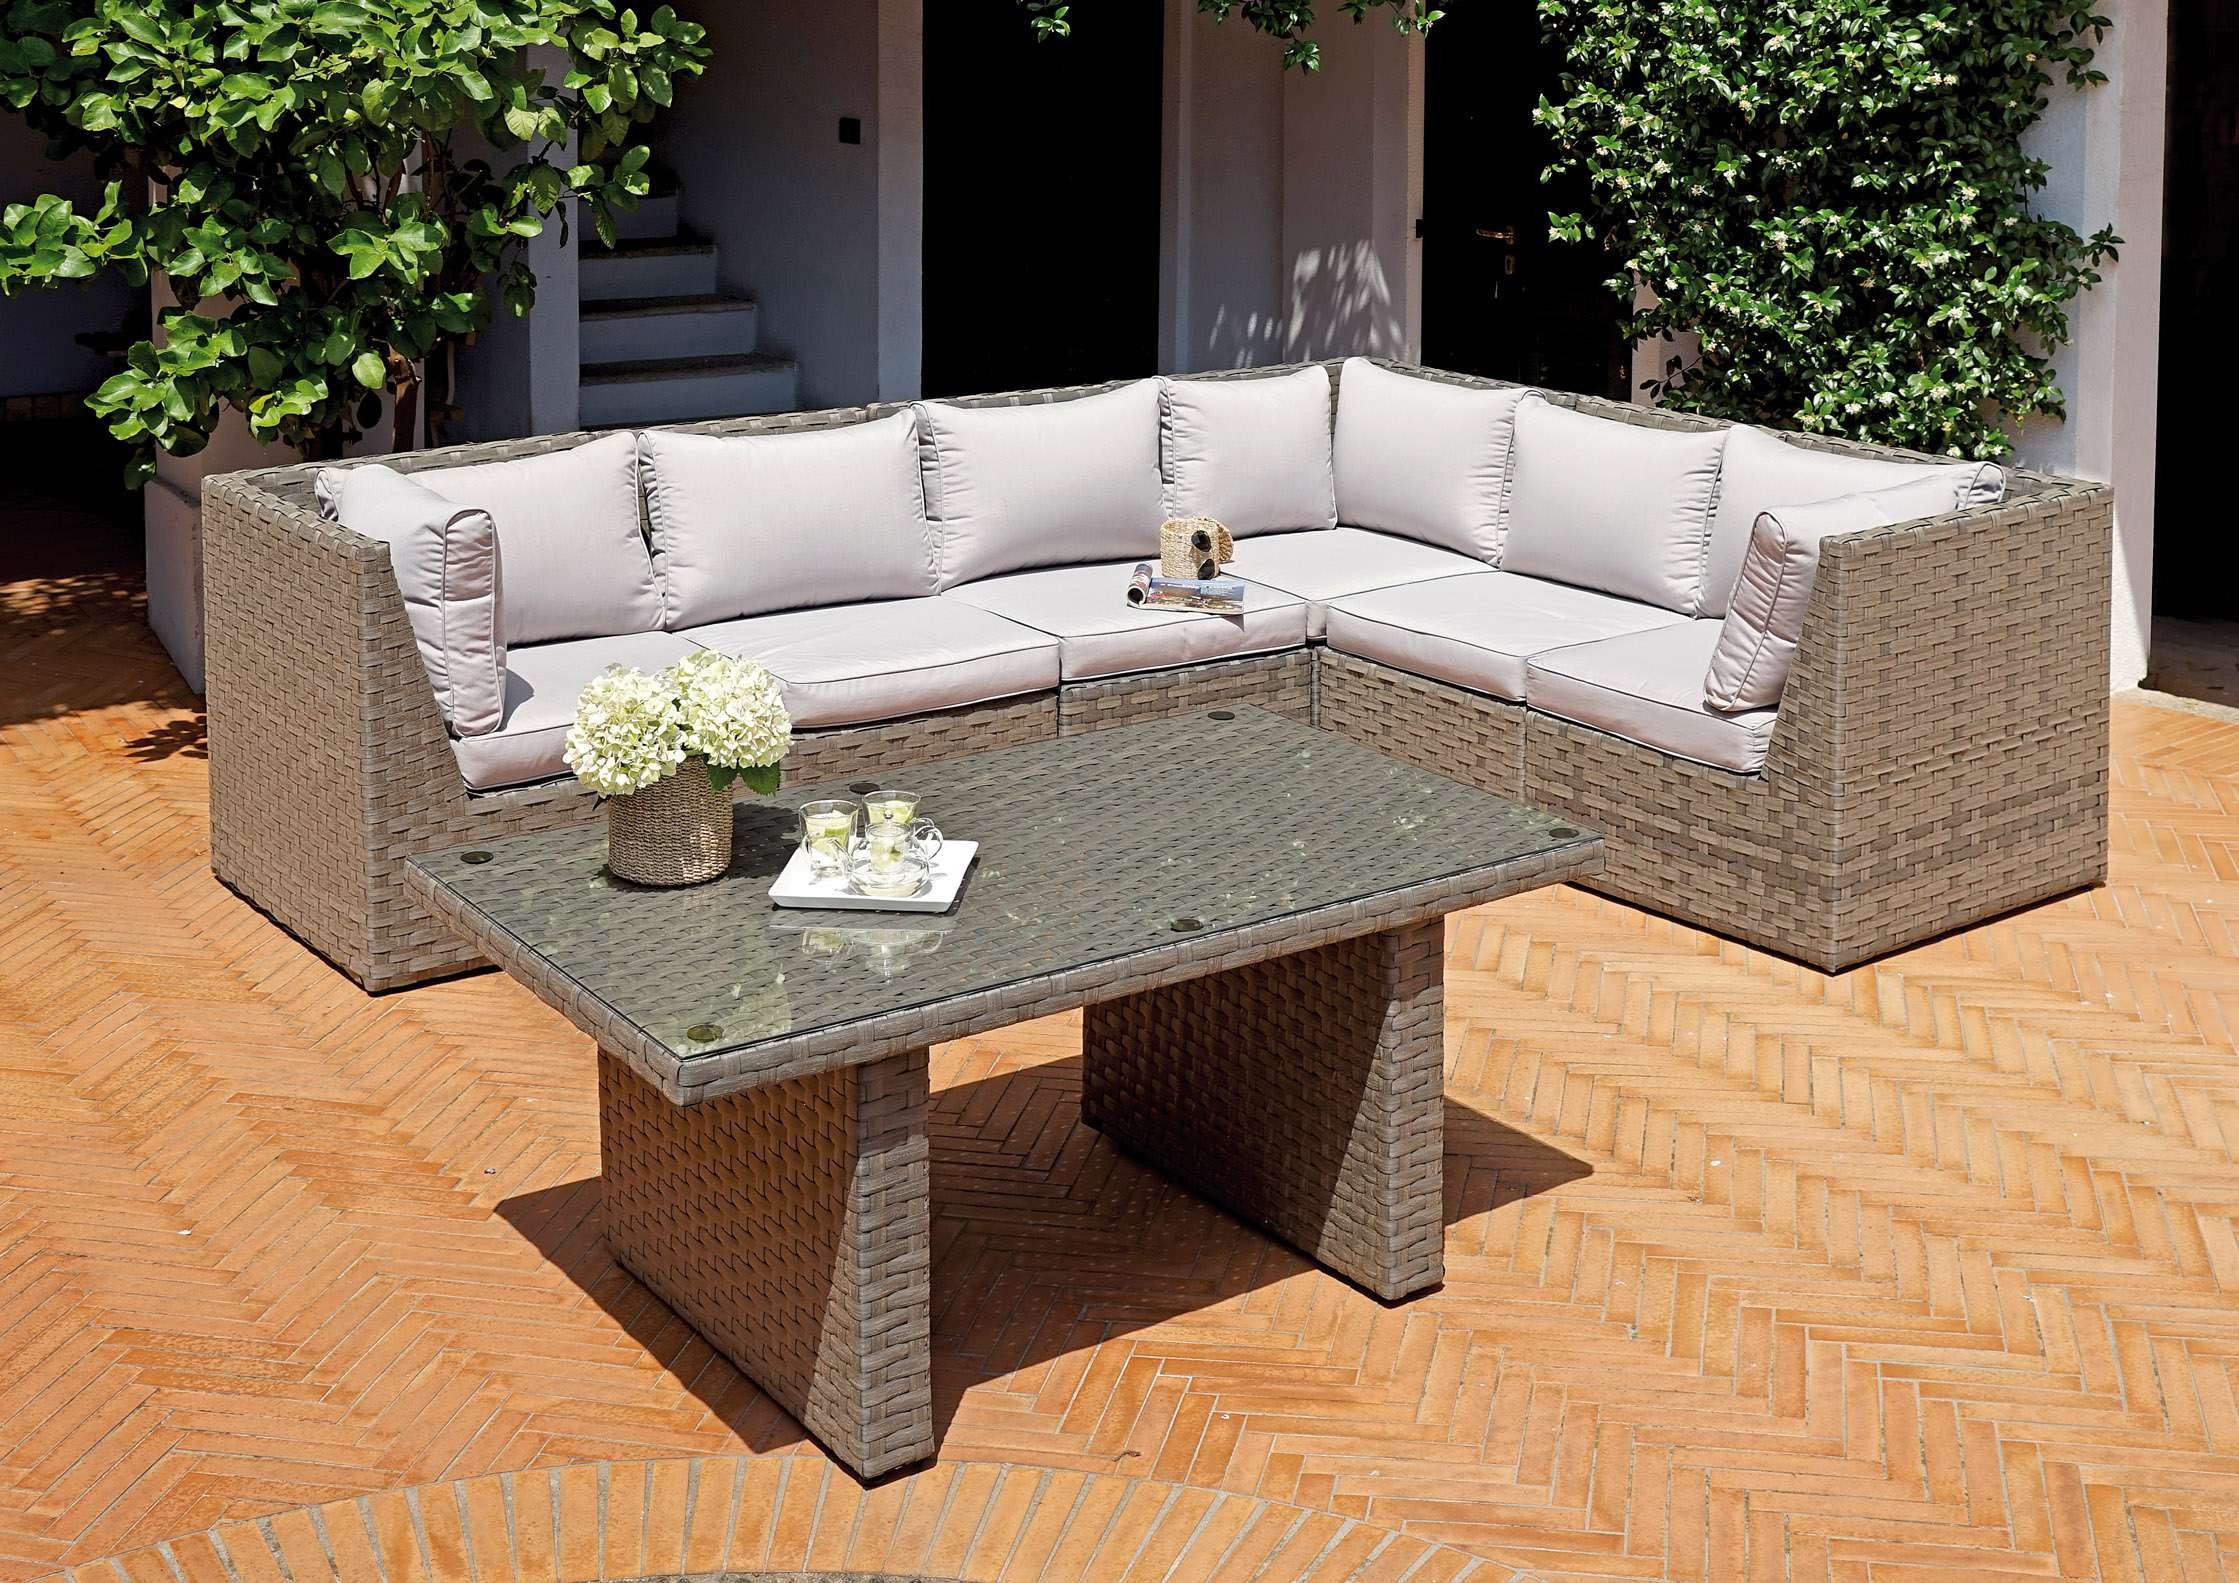 Set agrigento greenwood mobili da giardino for Set mobili da giardino